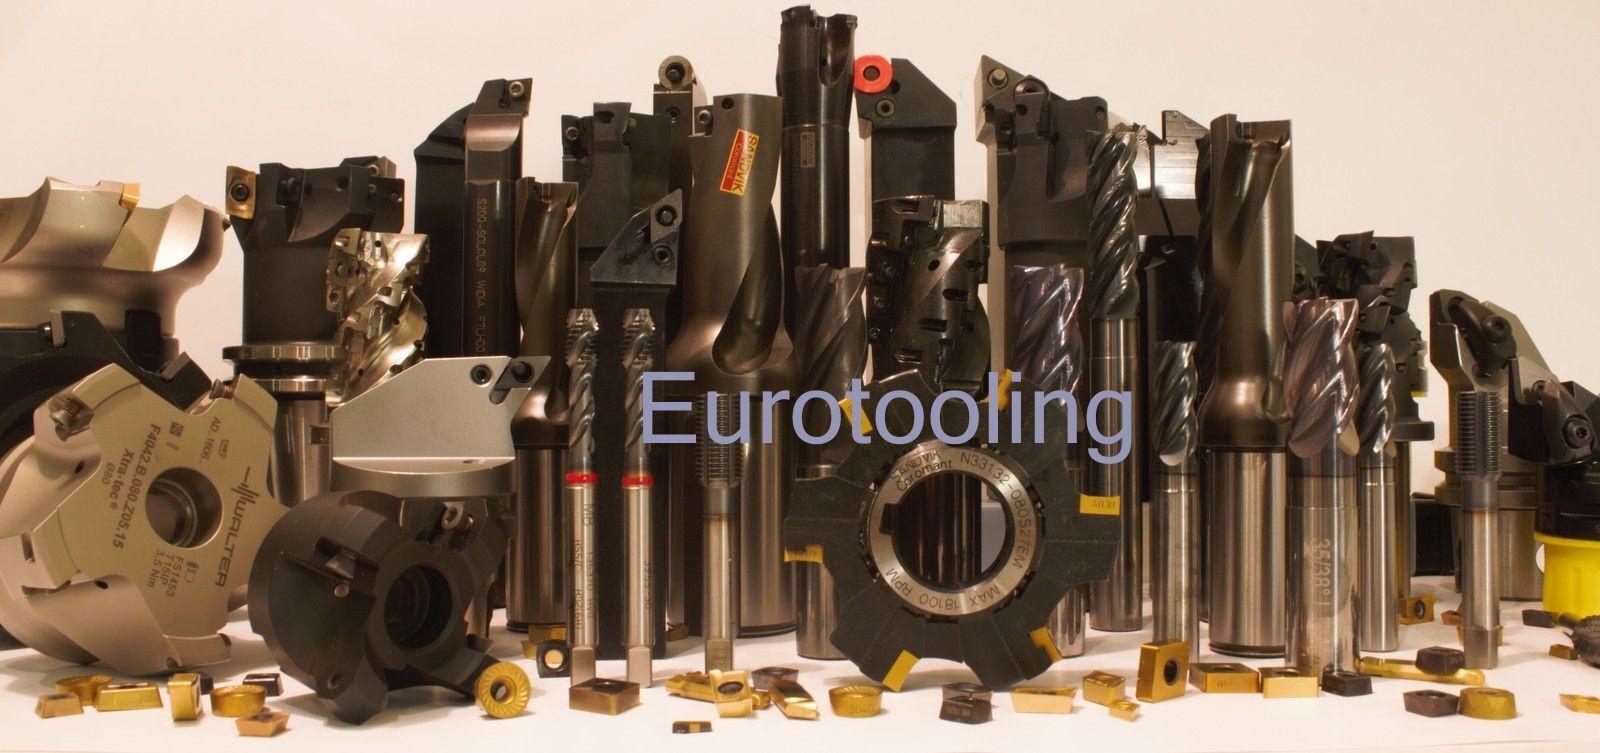 Eurotooling